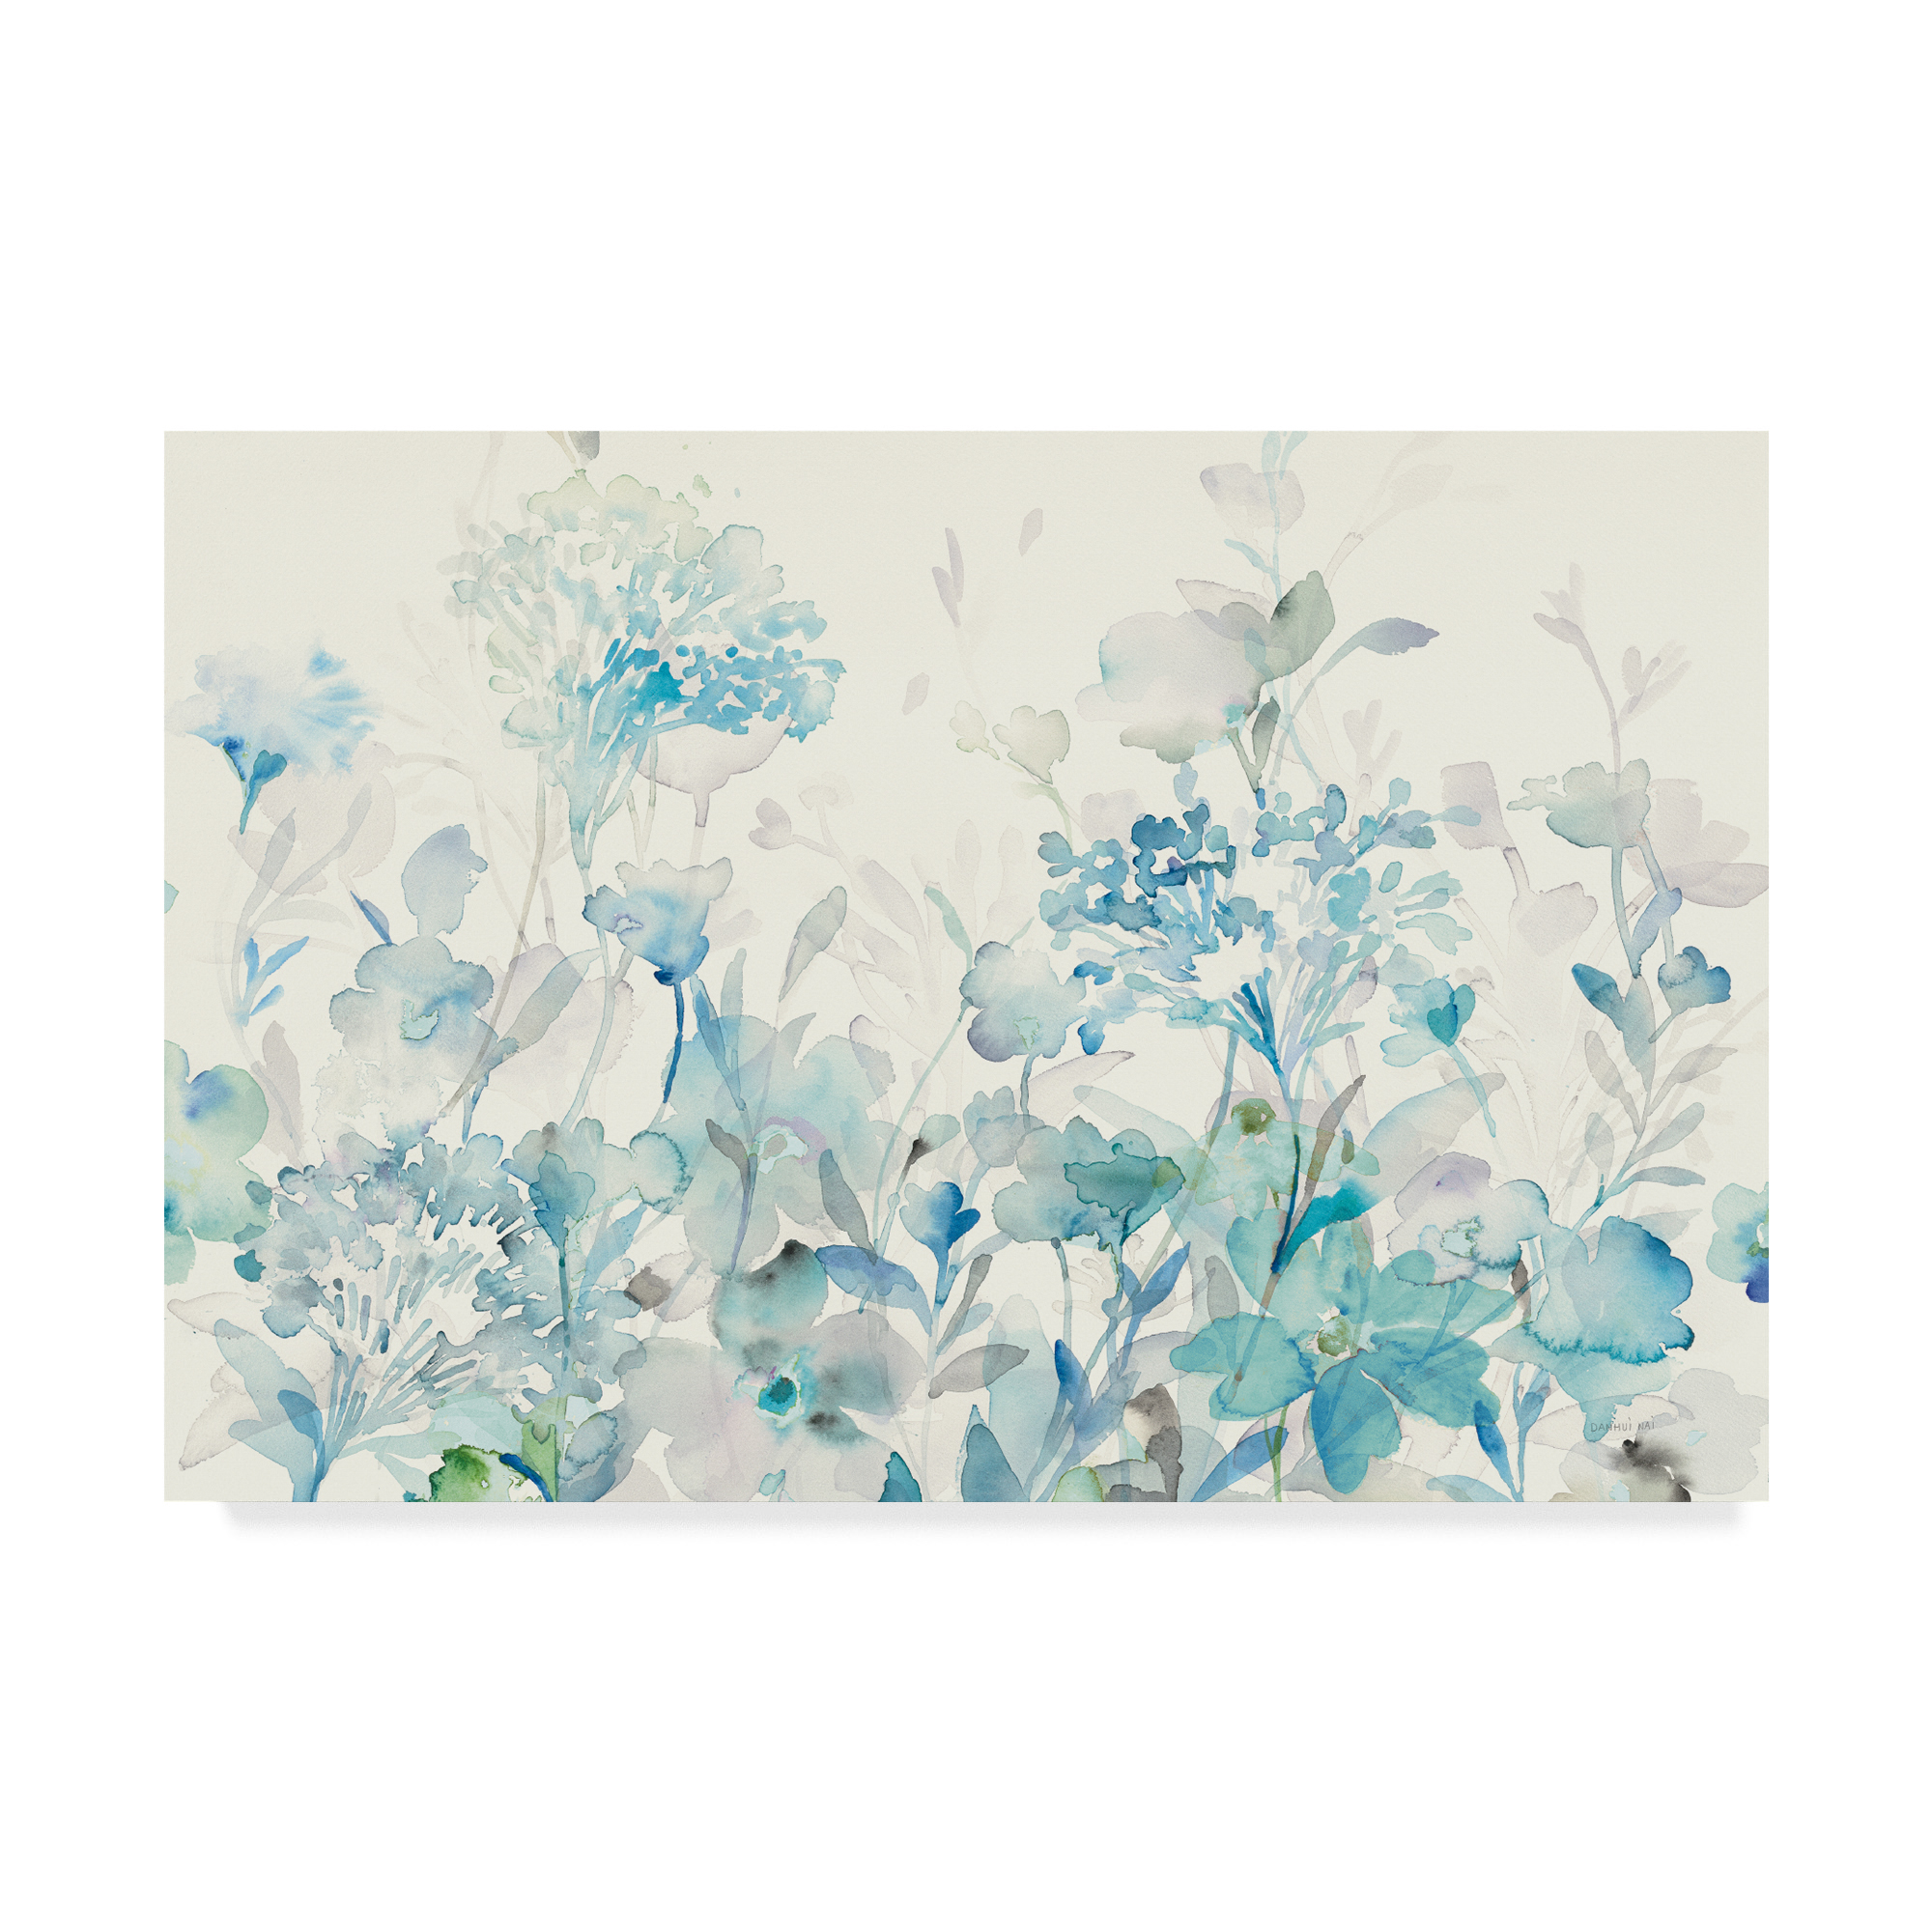 Treasures from The Sea III Aqua Giclee Stretched Canvas Artwork 18 x 18 Global Gallery Danhui NAI